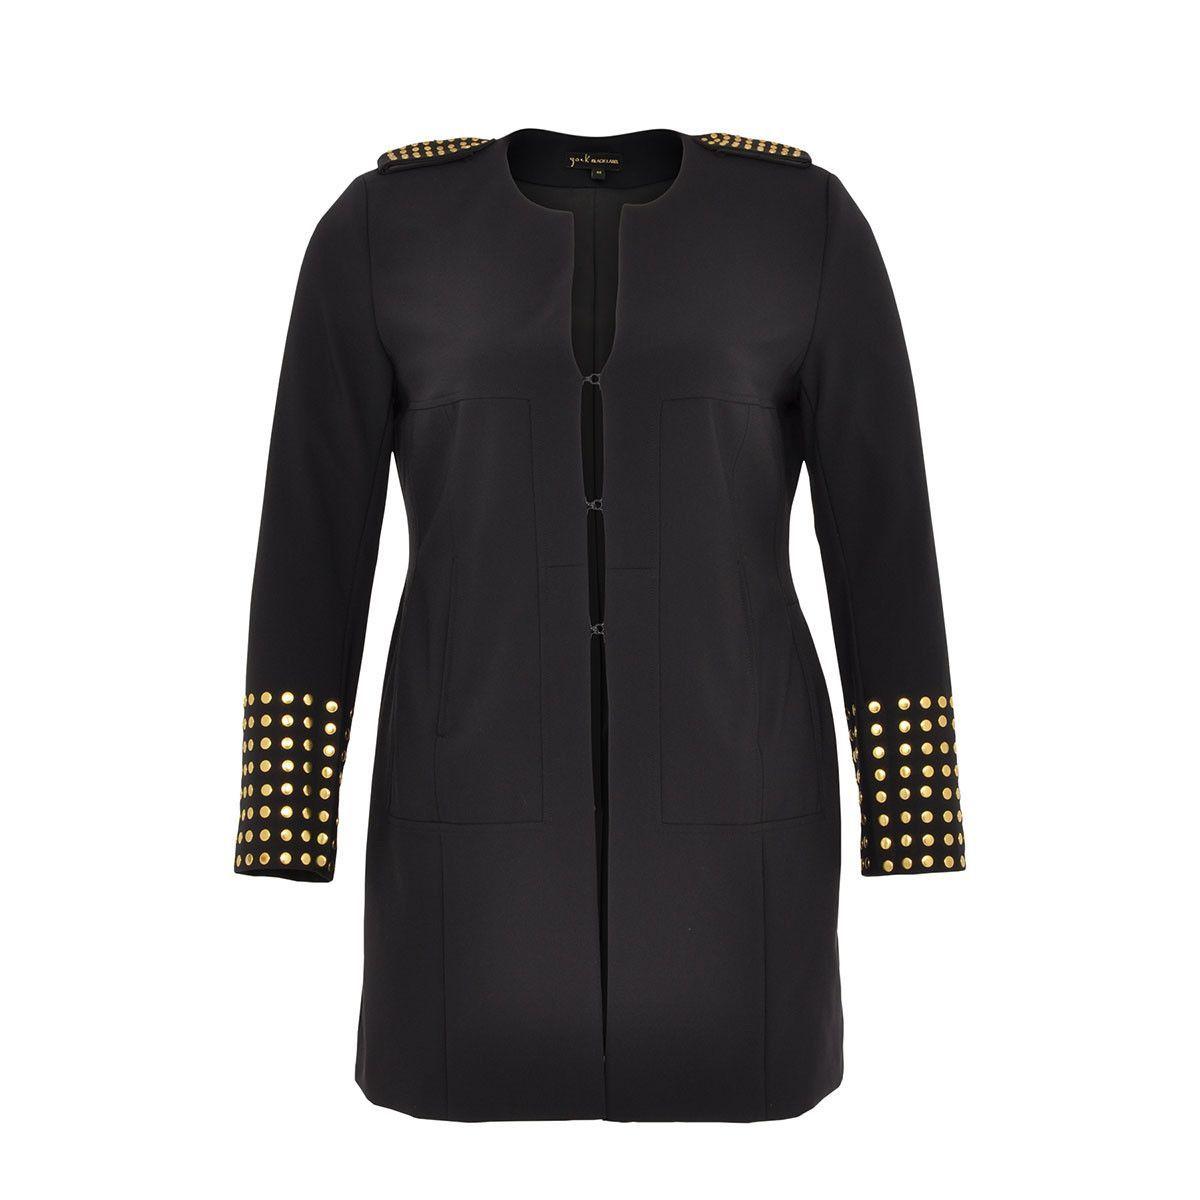 Yoek Black Label Long Studded Jacket